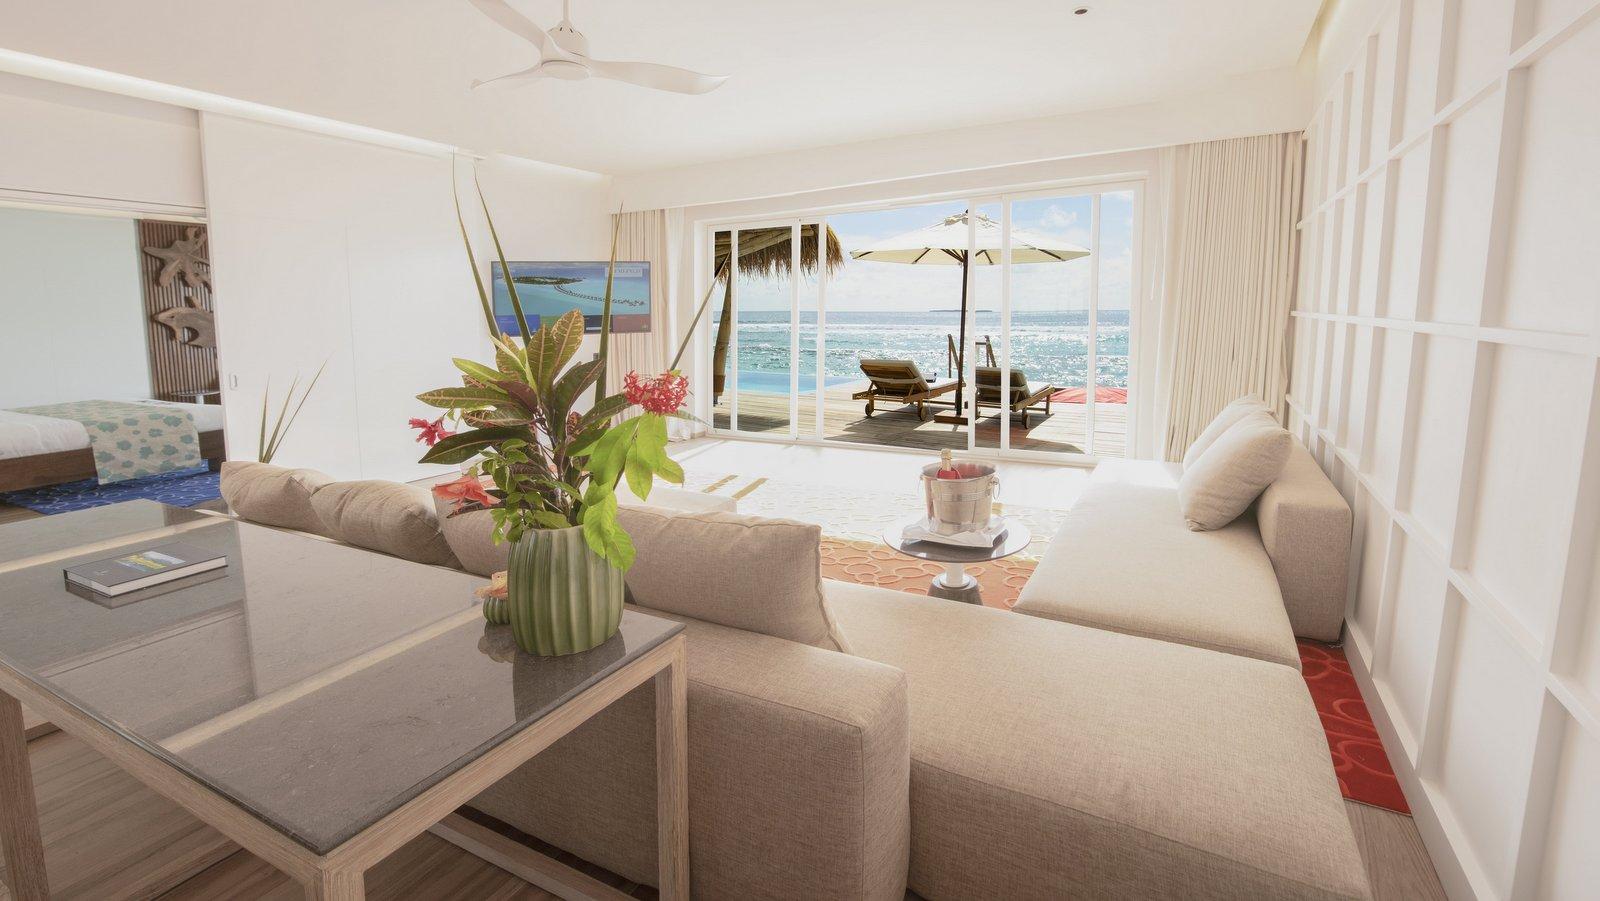 Мальдивы, отель Emerald Maldives Resort & Spa, номер Superior Water Villa with Pool